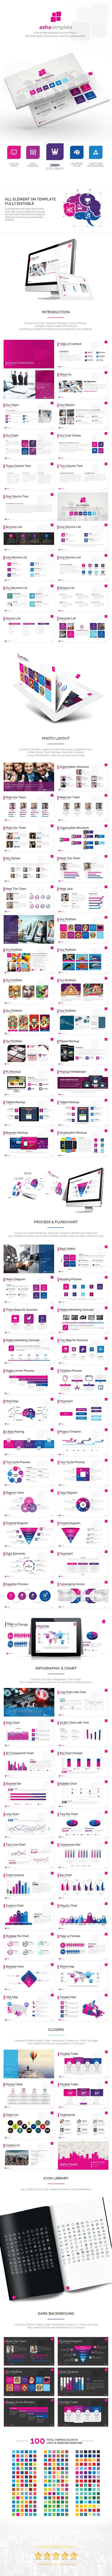 Asha - Business Powerpoint Template - Business PowerPoint Templates